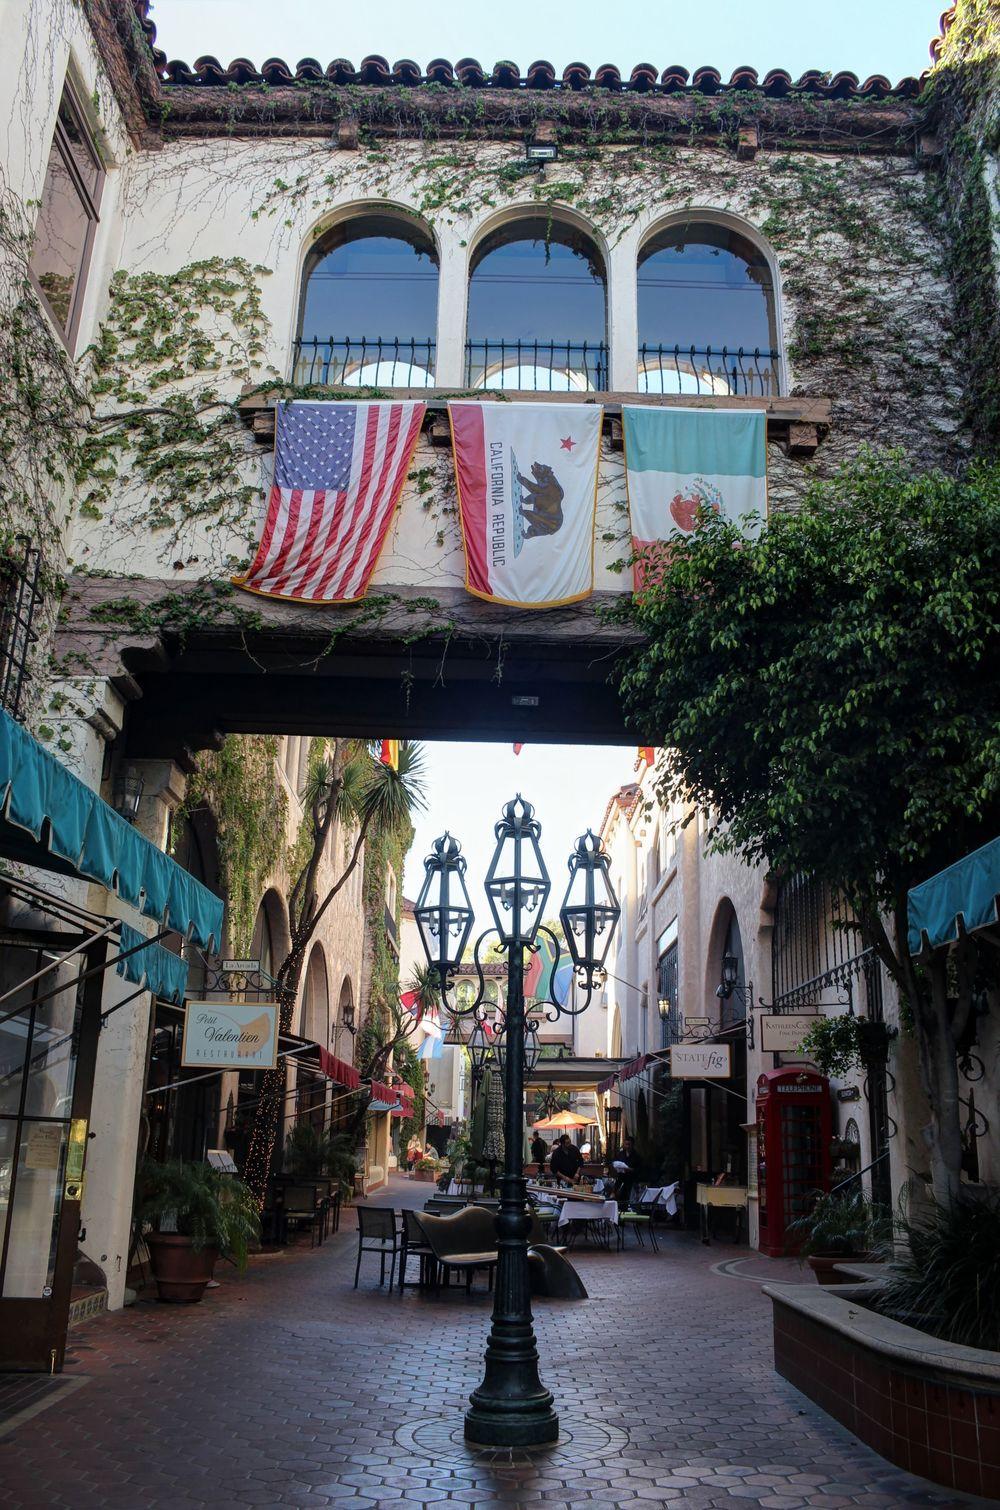 Ruelle de Santa Barbara, CA, USA